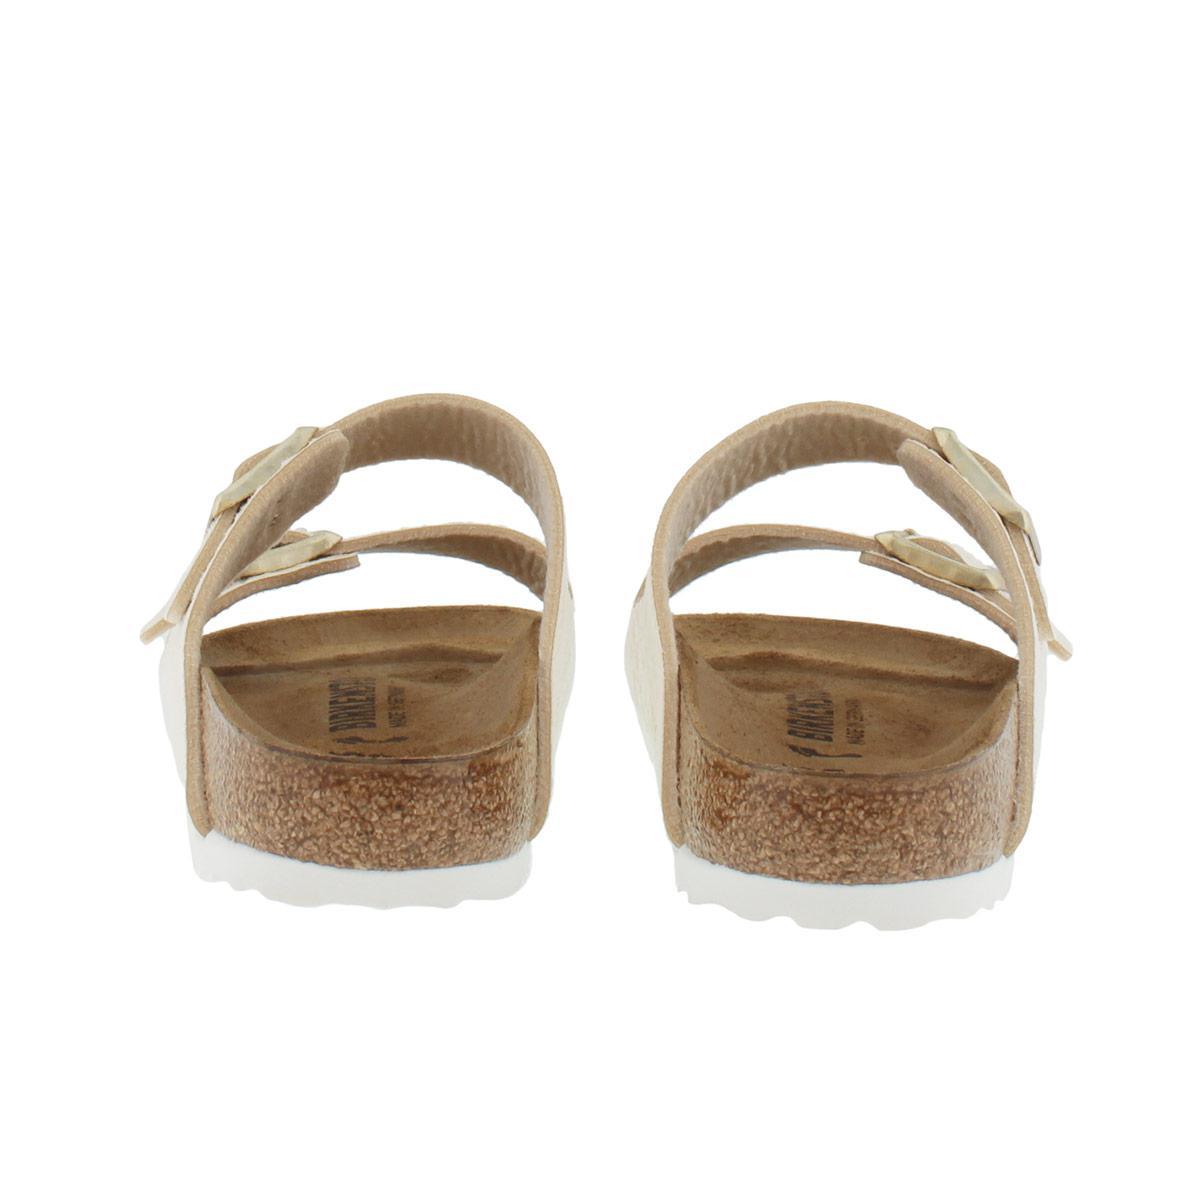 7a61e19b5bd76 Birkenstock Arizona Bs Narrow Fit Sandal Shiny Snake Cream in White ...